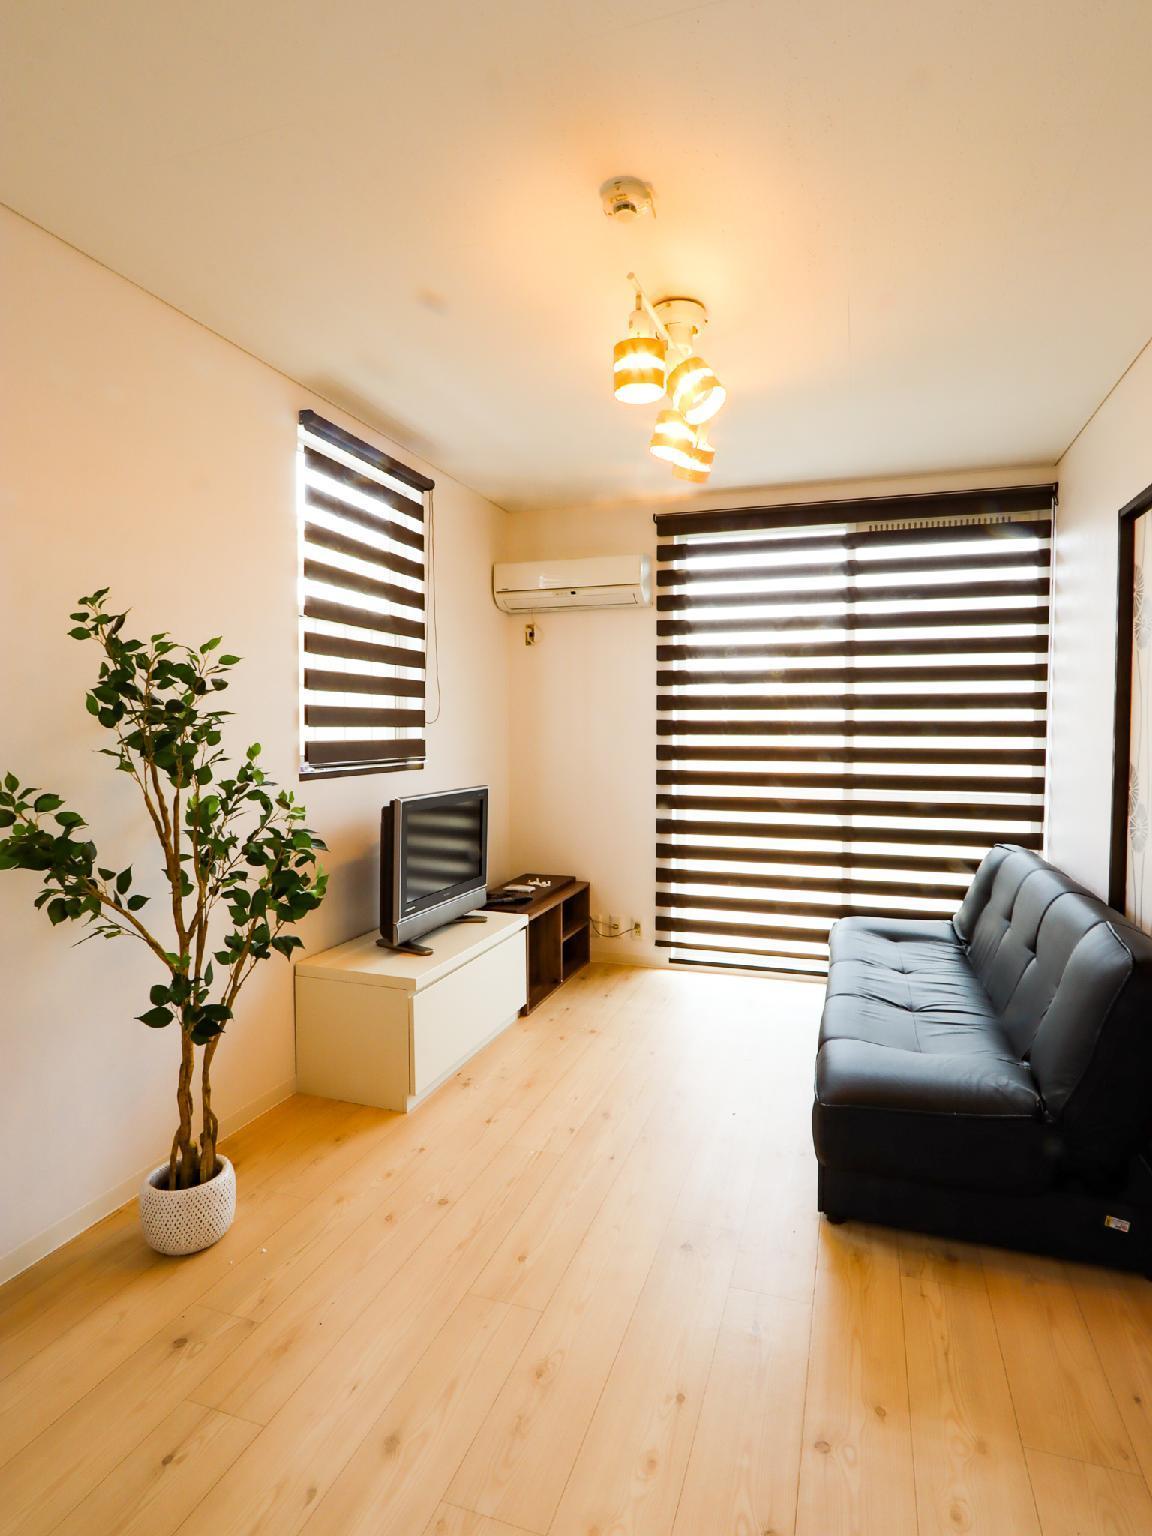 Exclusive Apartment Room In Chigasaki And Kamakura